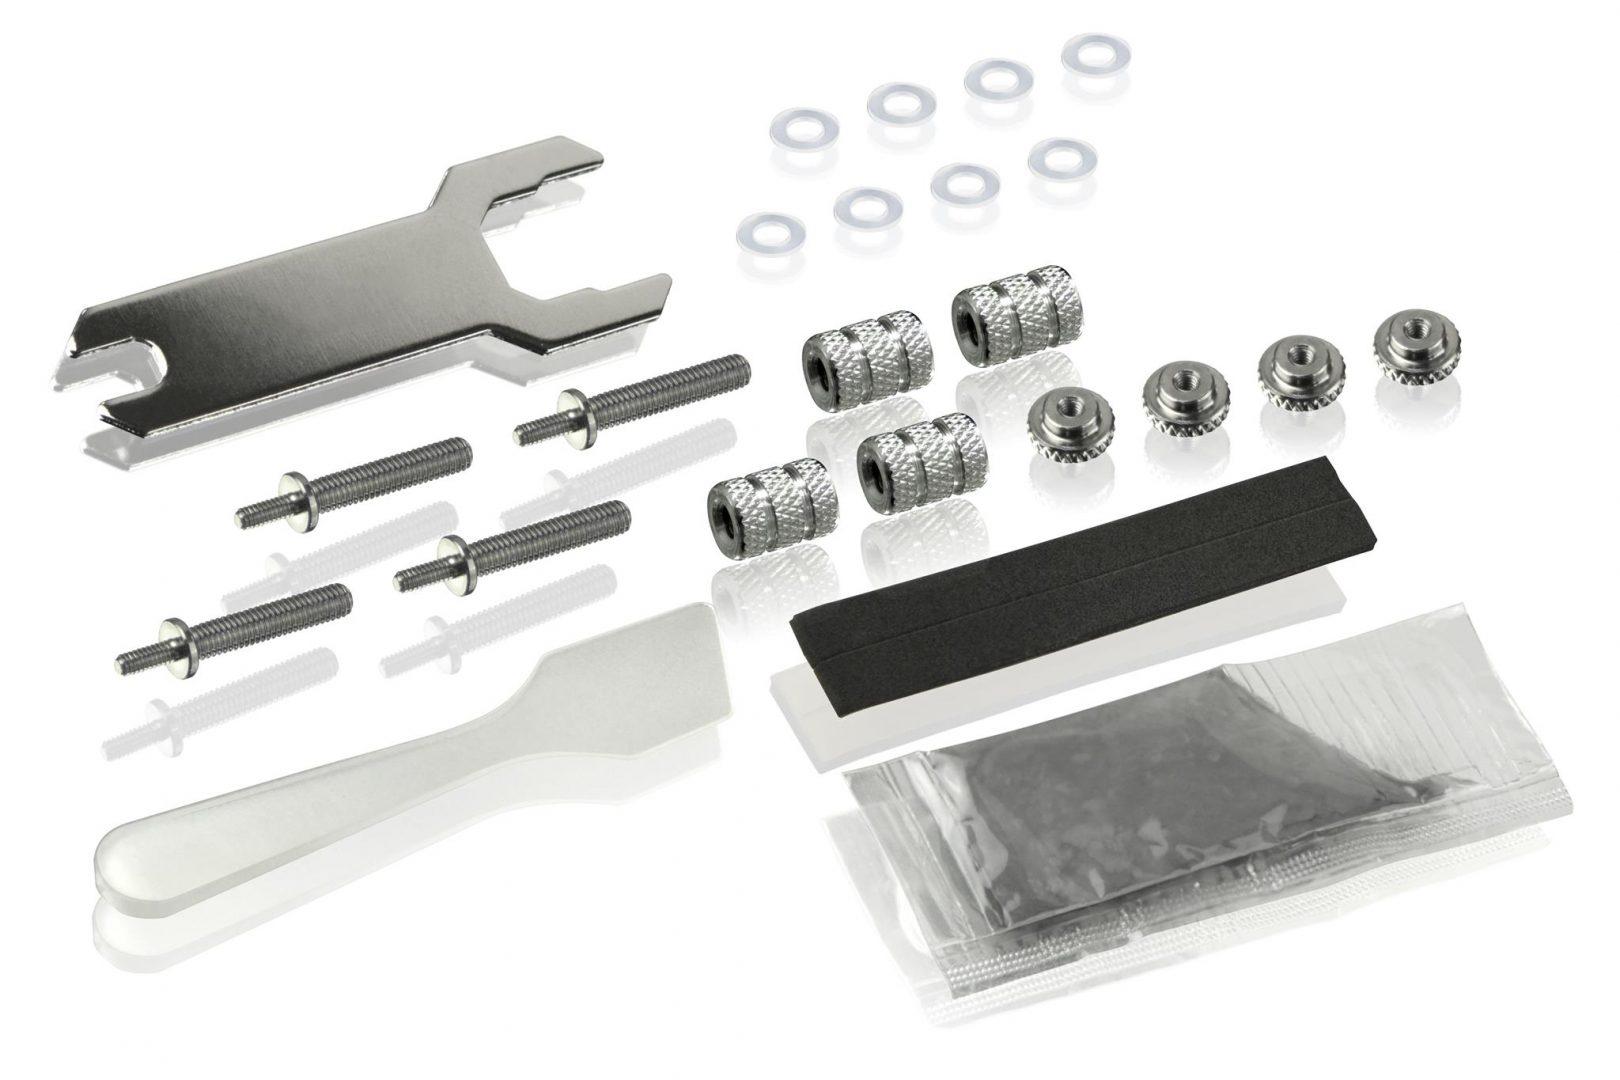 waterblock-gpu-accessories